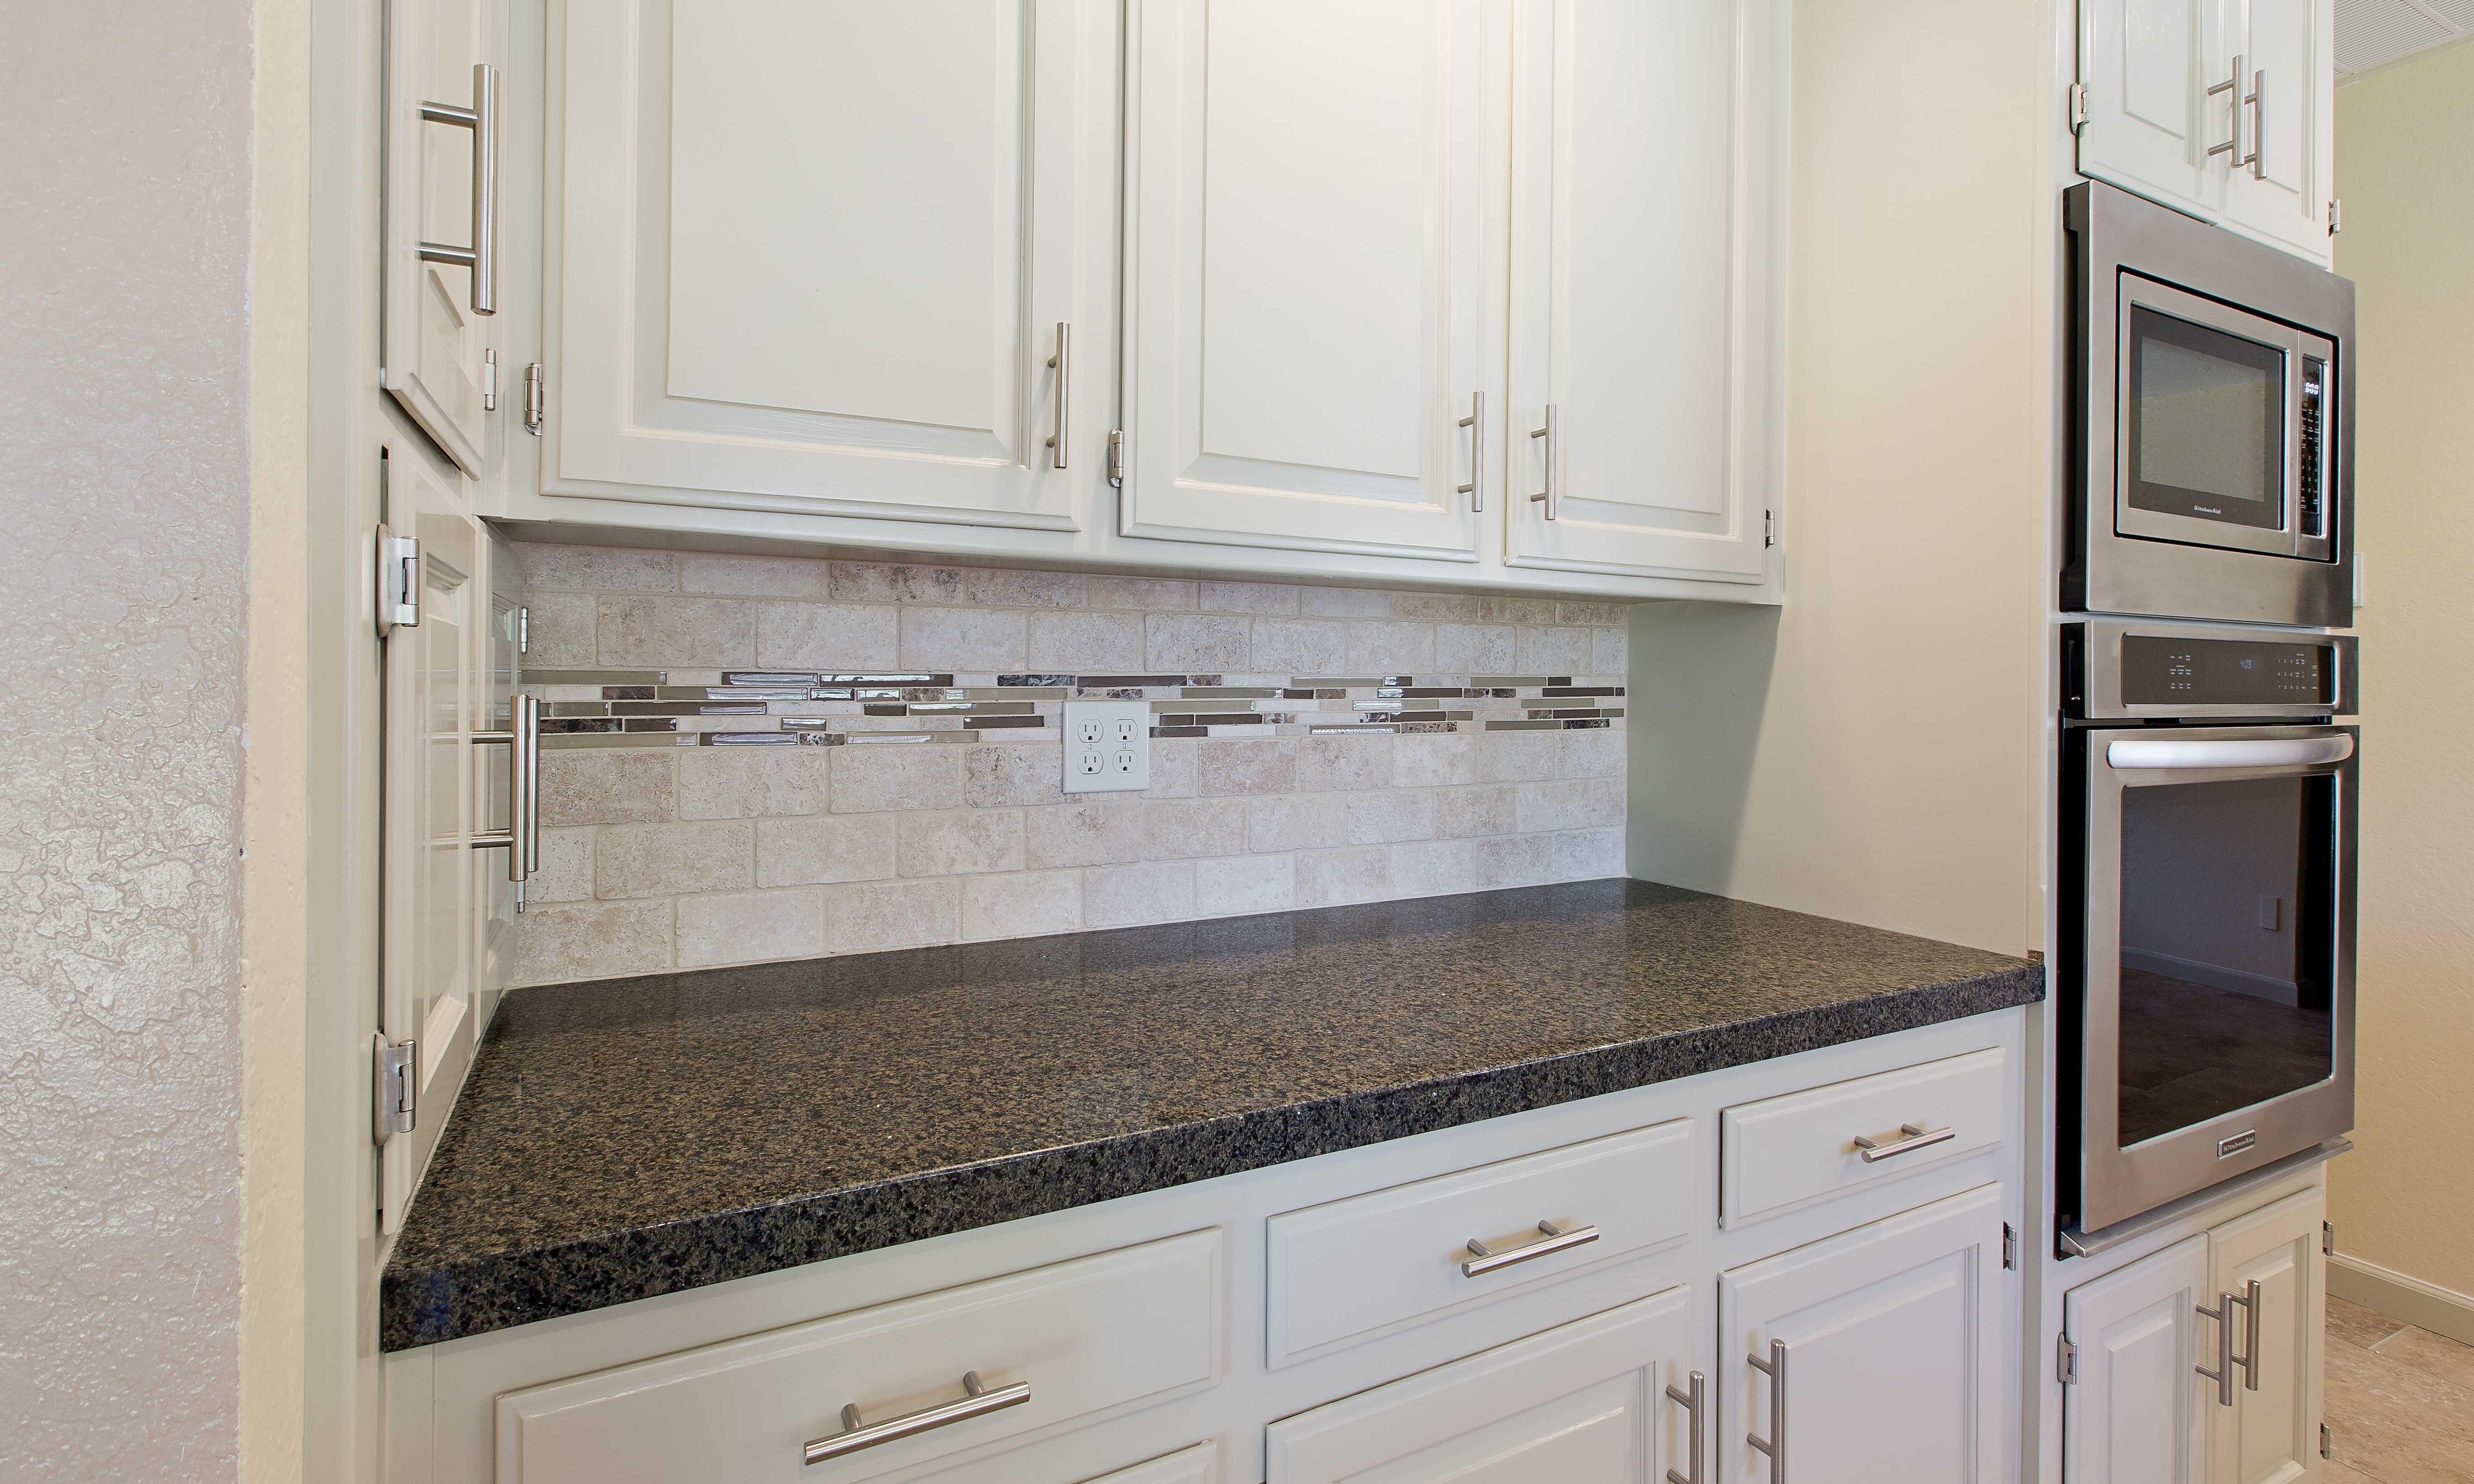 Enchanting Accent Tiles For Kitchen Backsplash And Subway